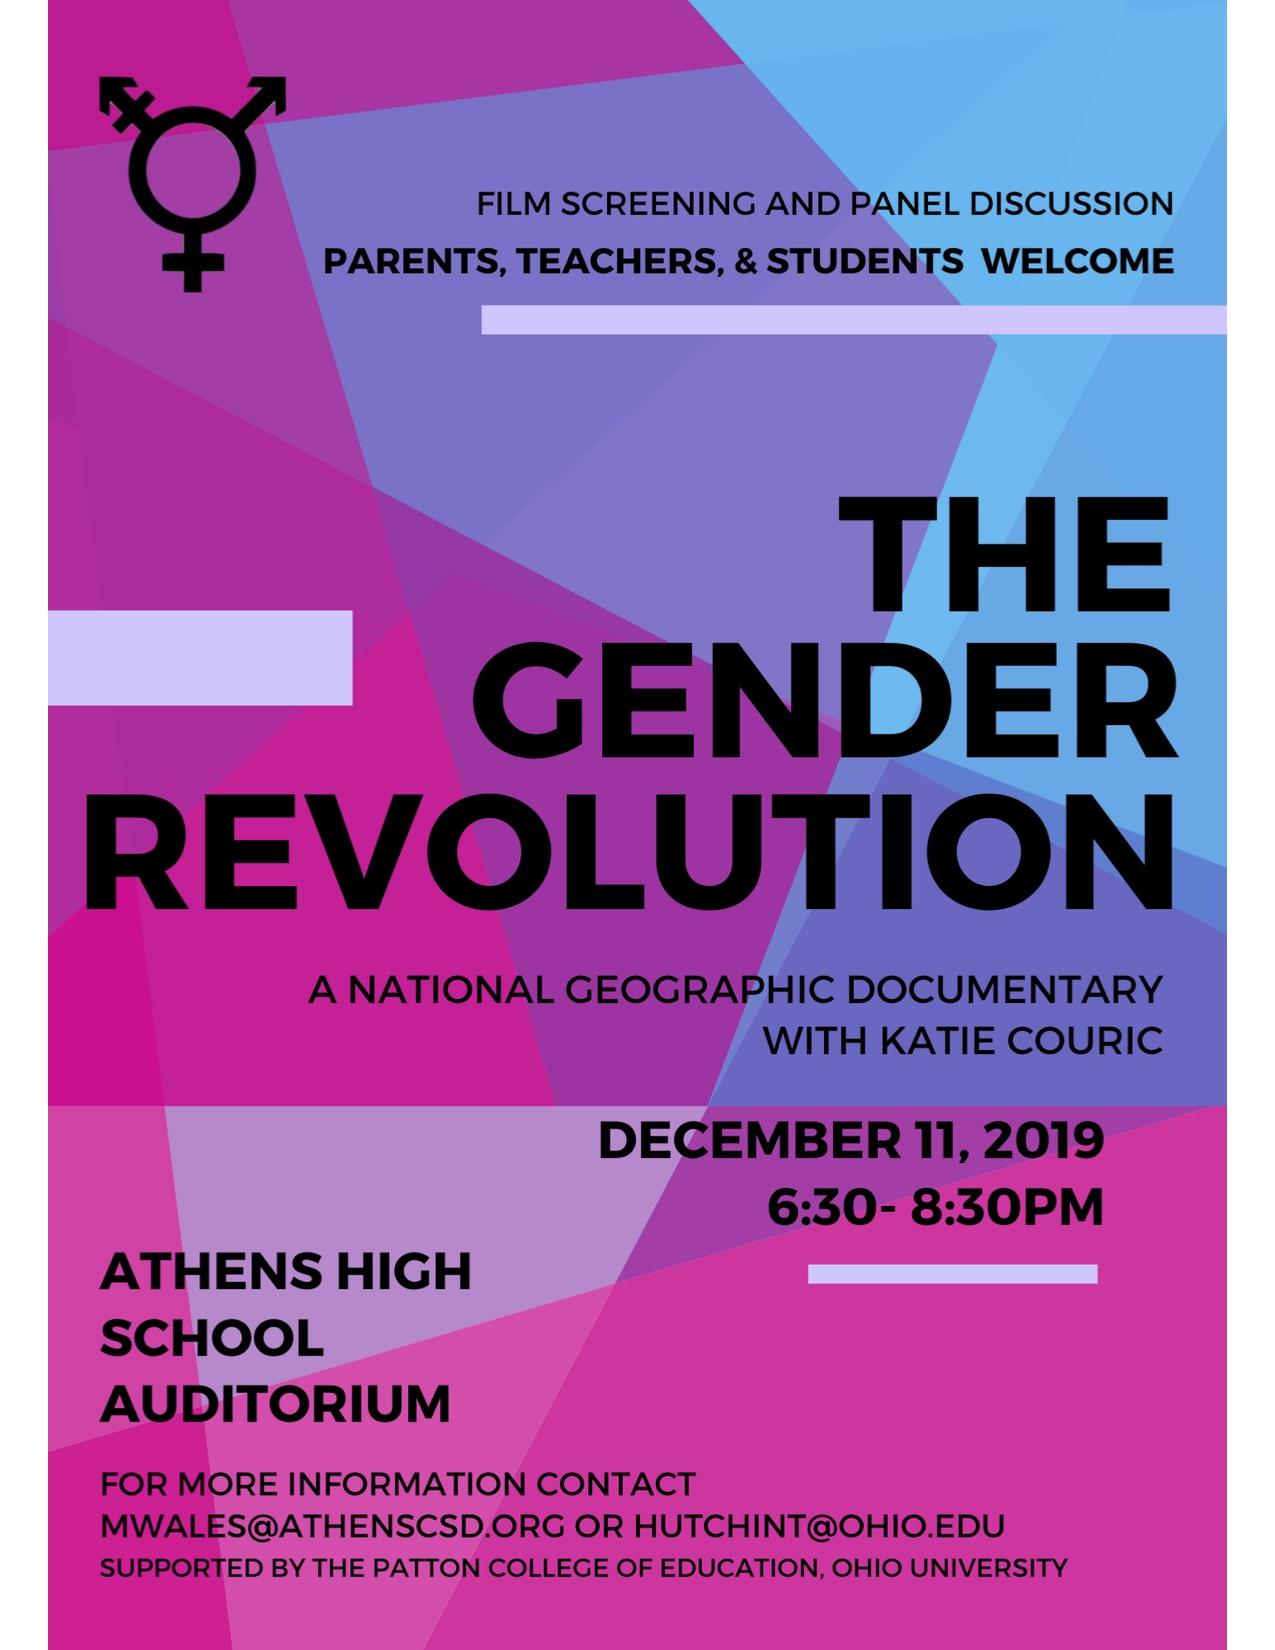 The Gender Revolution flier